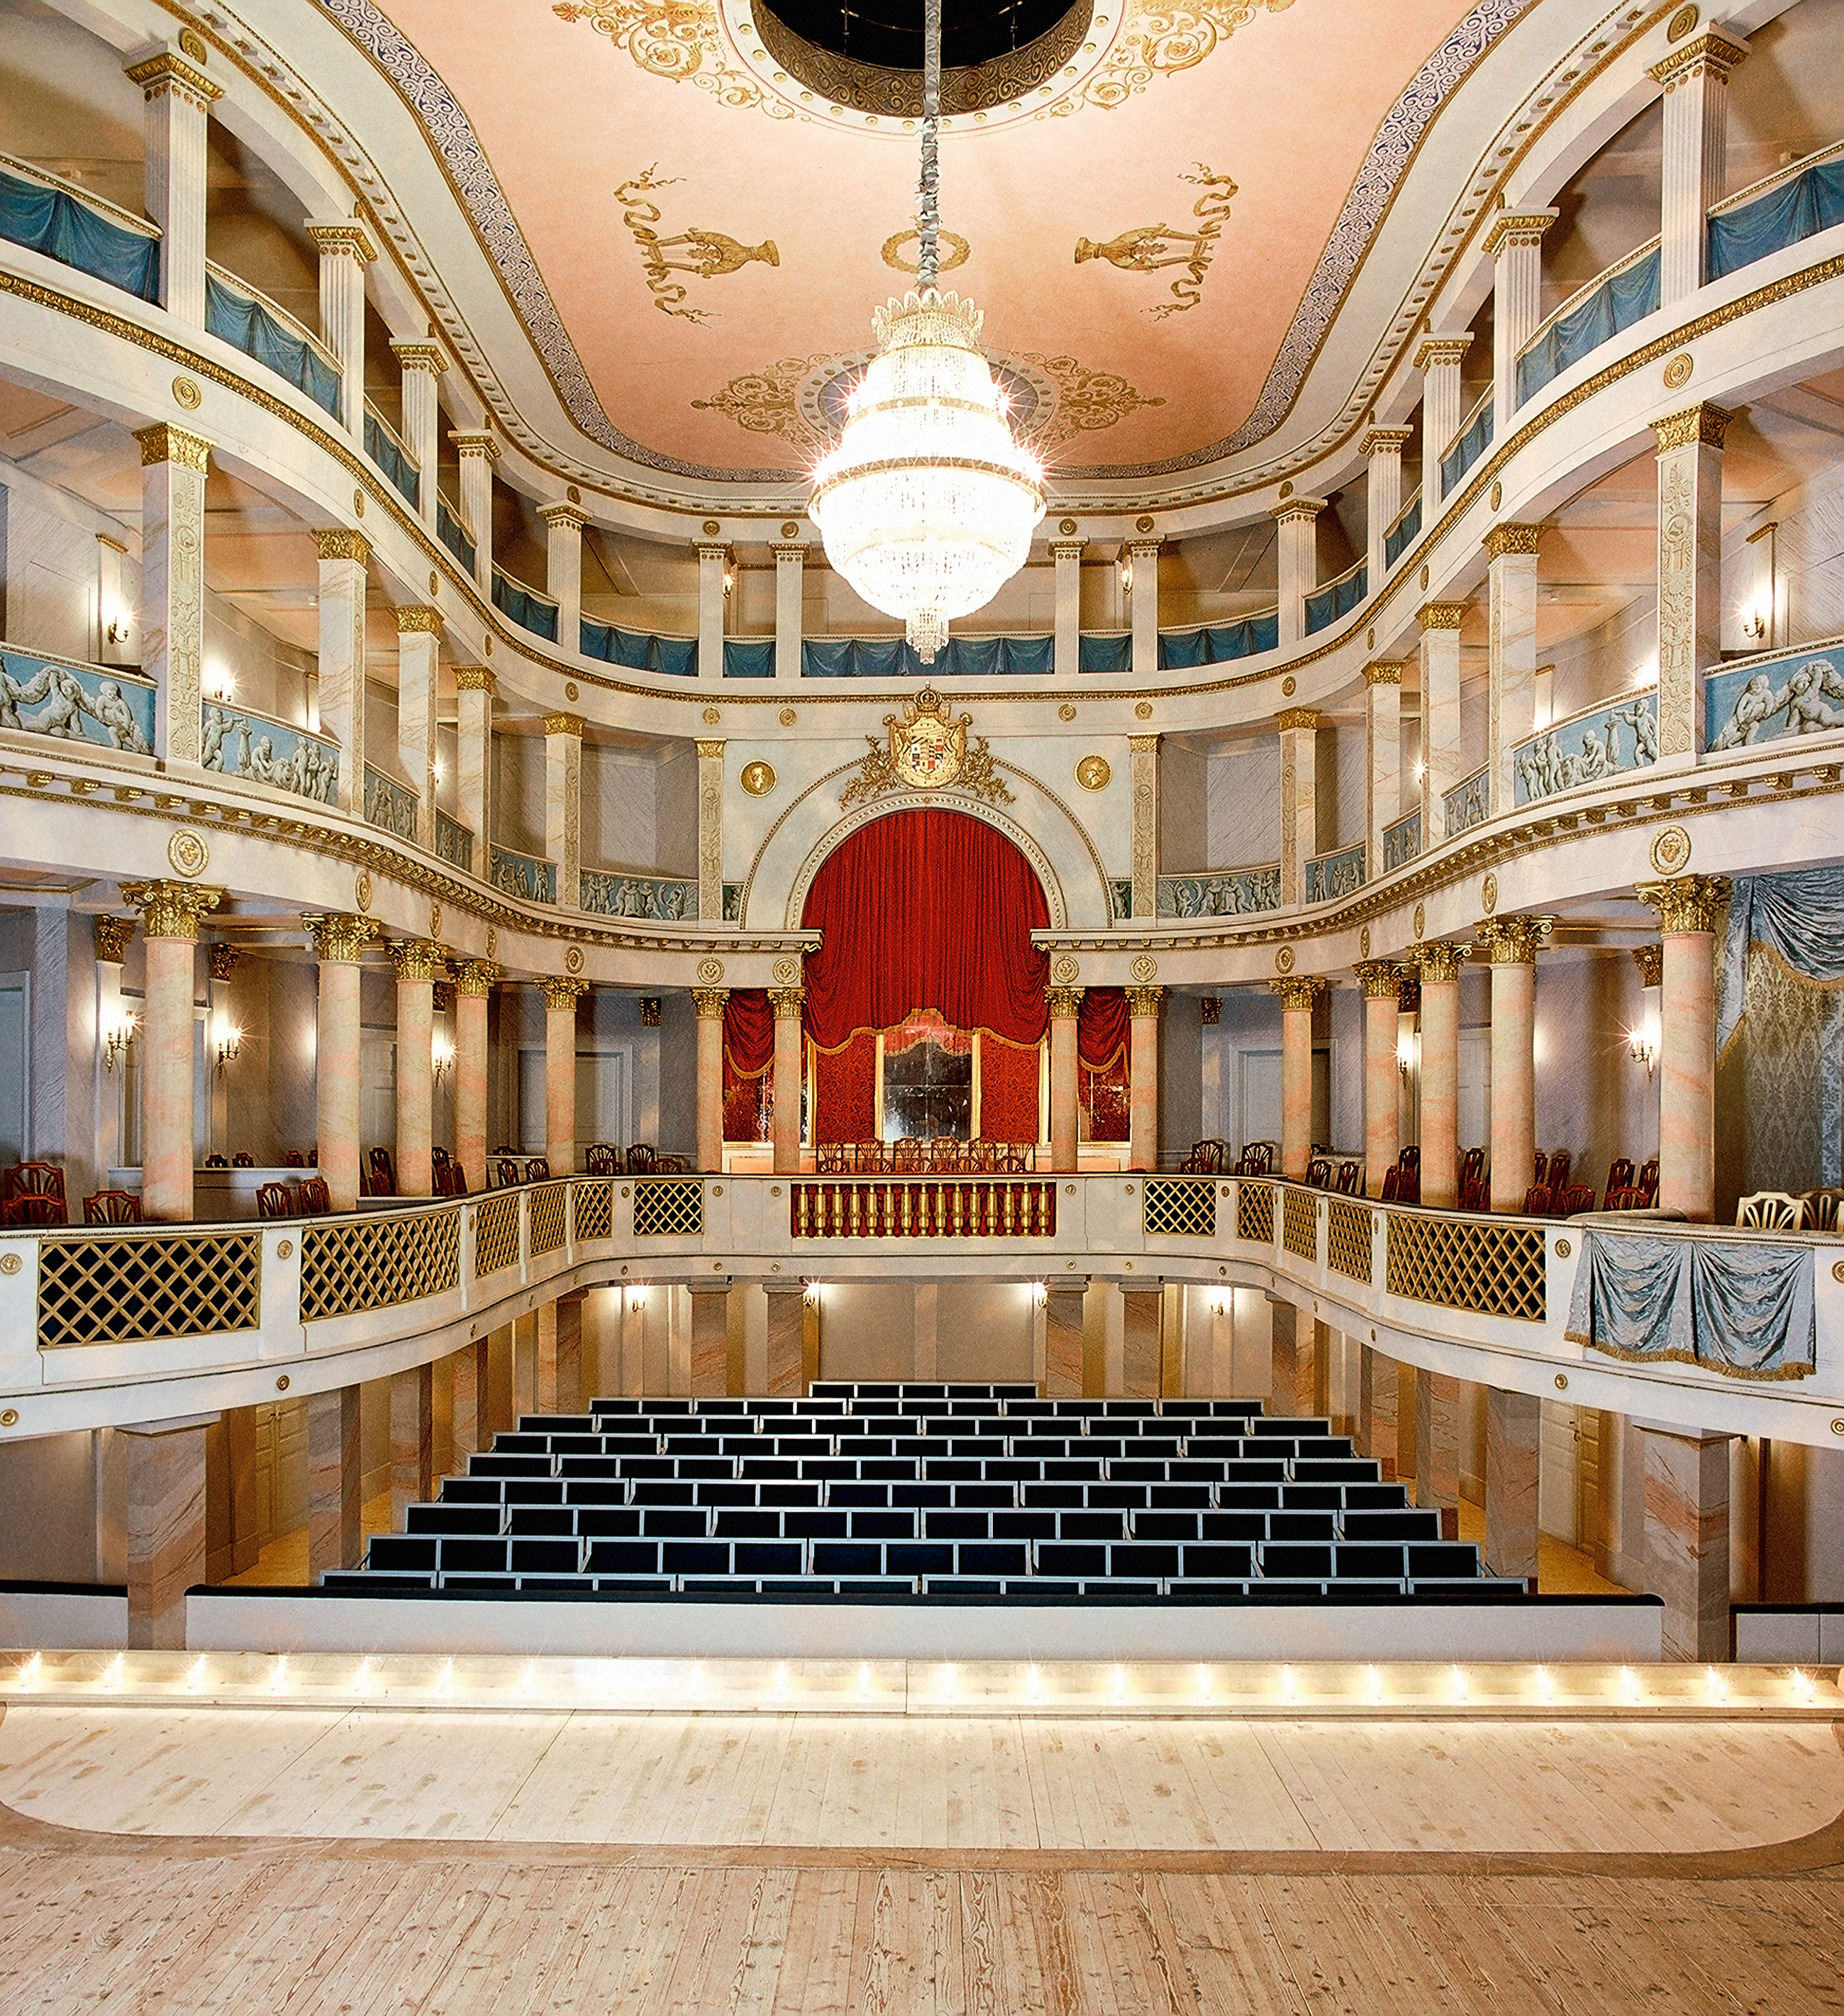 24_ludwigsburg_rsl_innen_lmz972185_1998_schlosstheater_foto-ssg-joachim-feist_2600_ssg-pressebild